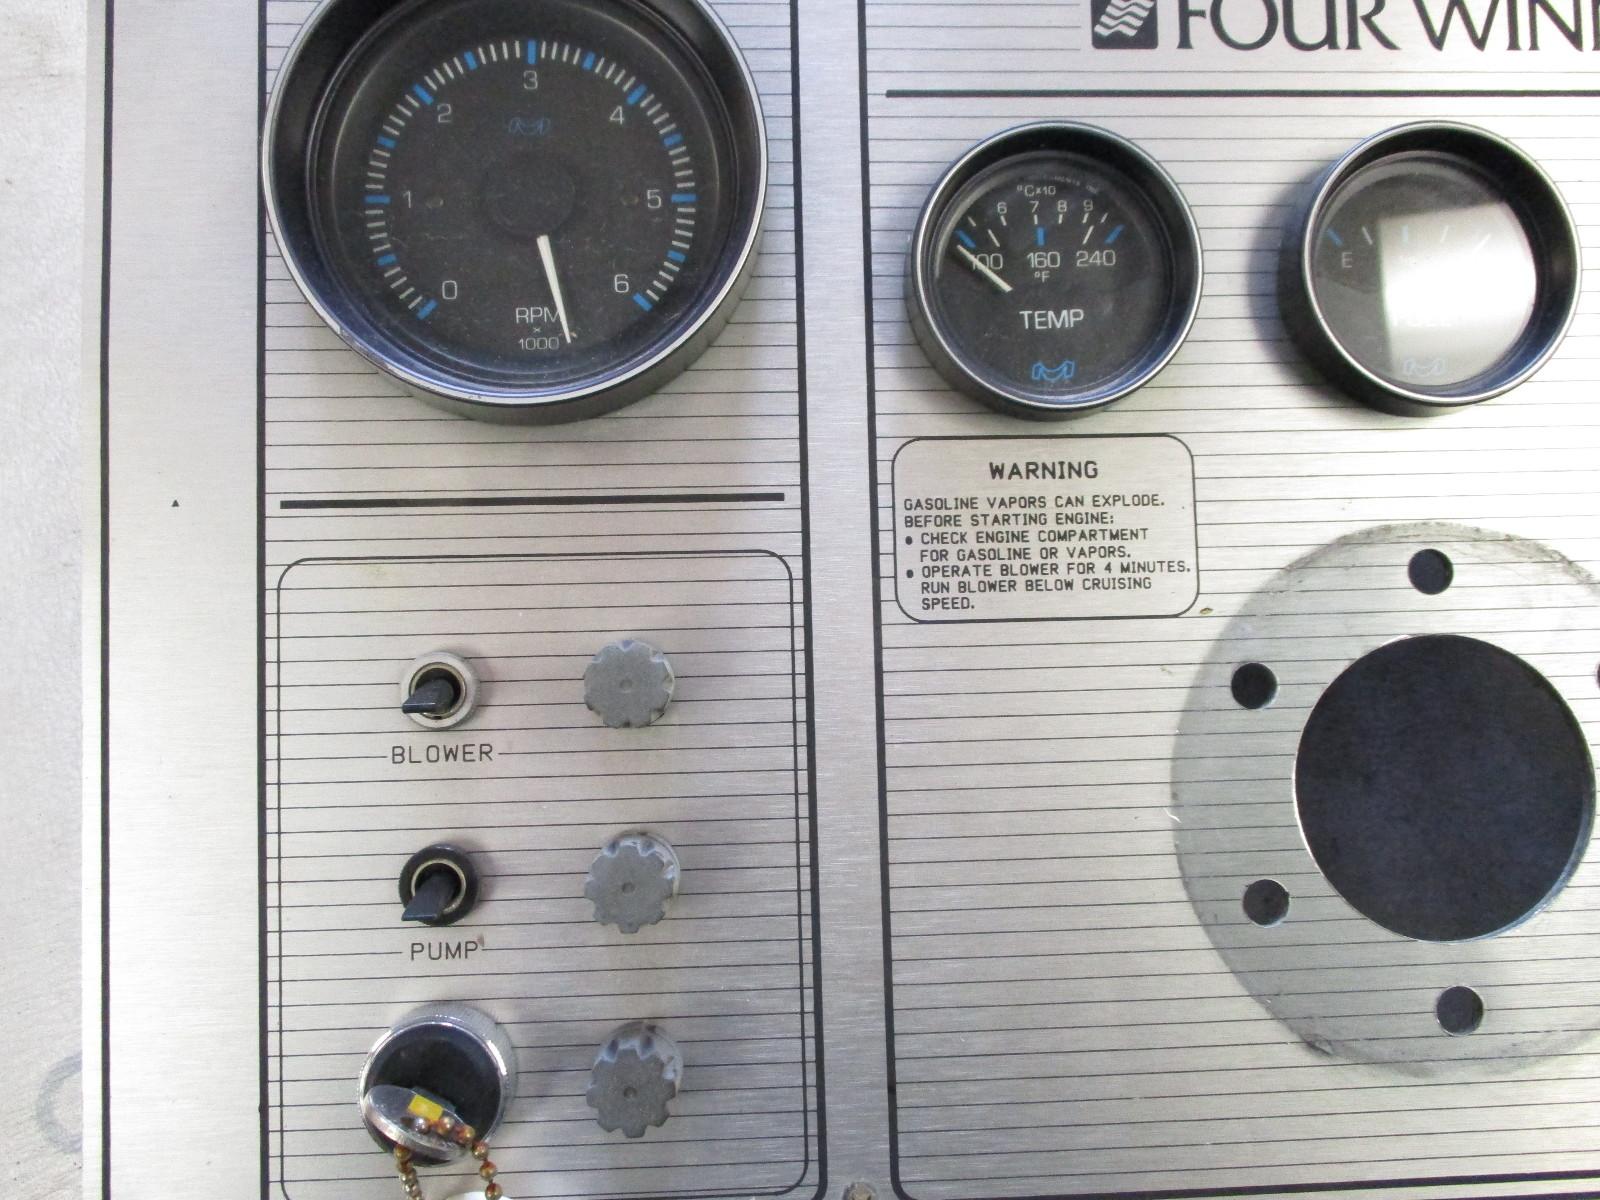 1988 Four Winns 160 Freedom Marine Boat Dash Panel & Gauges Switches